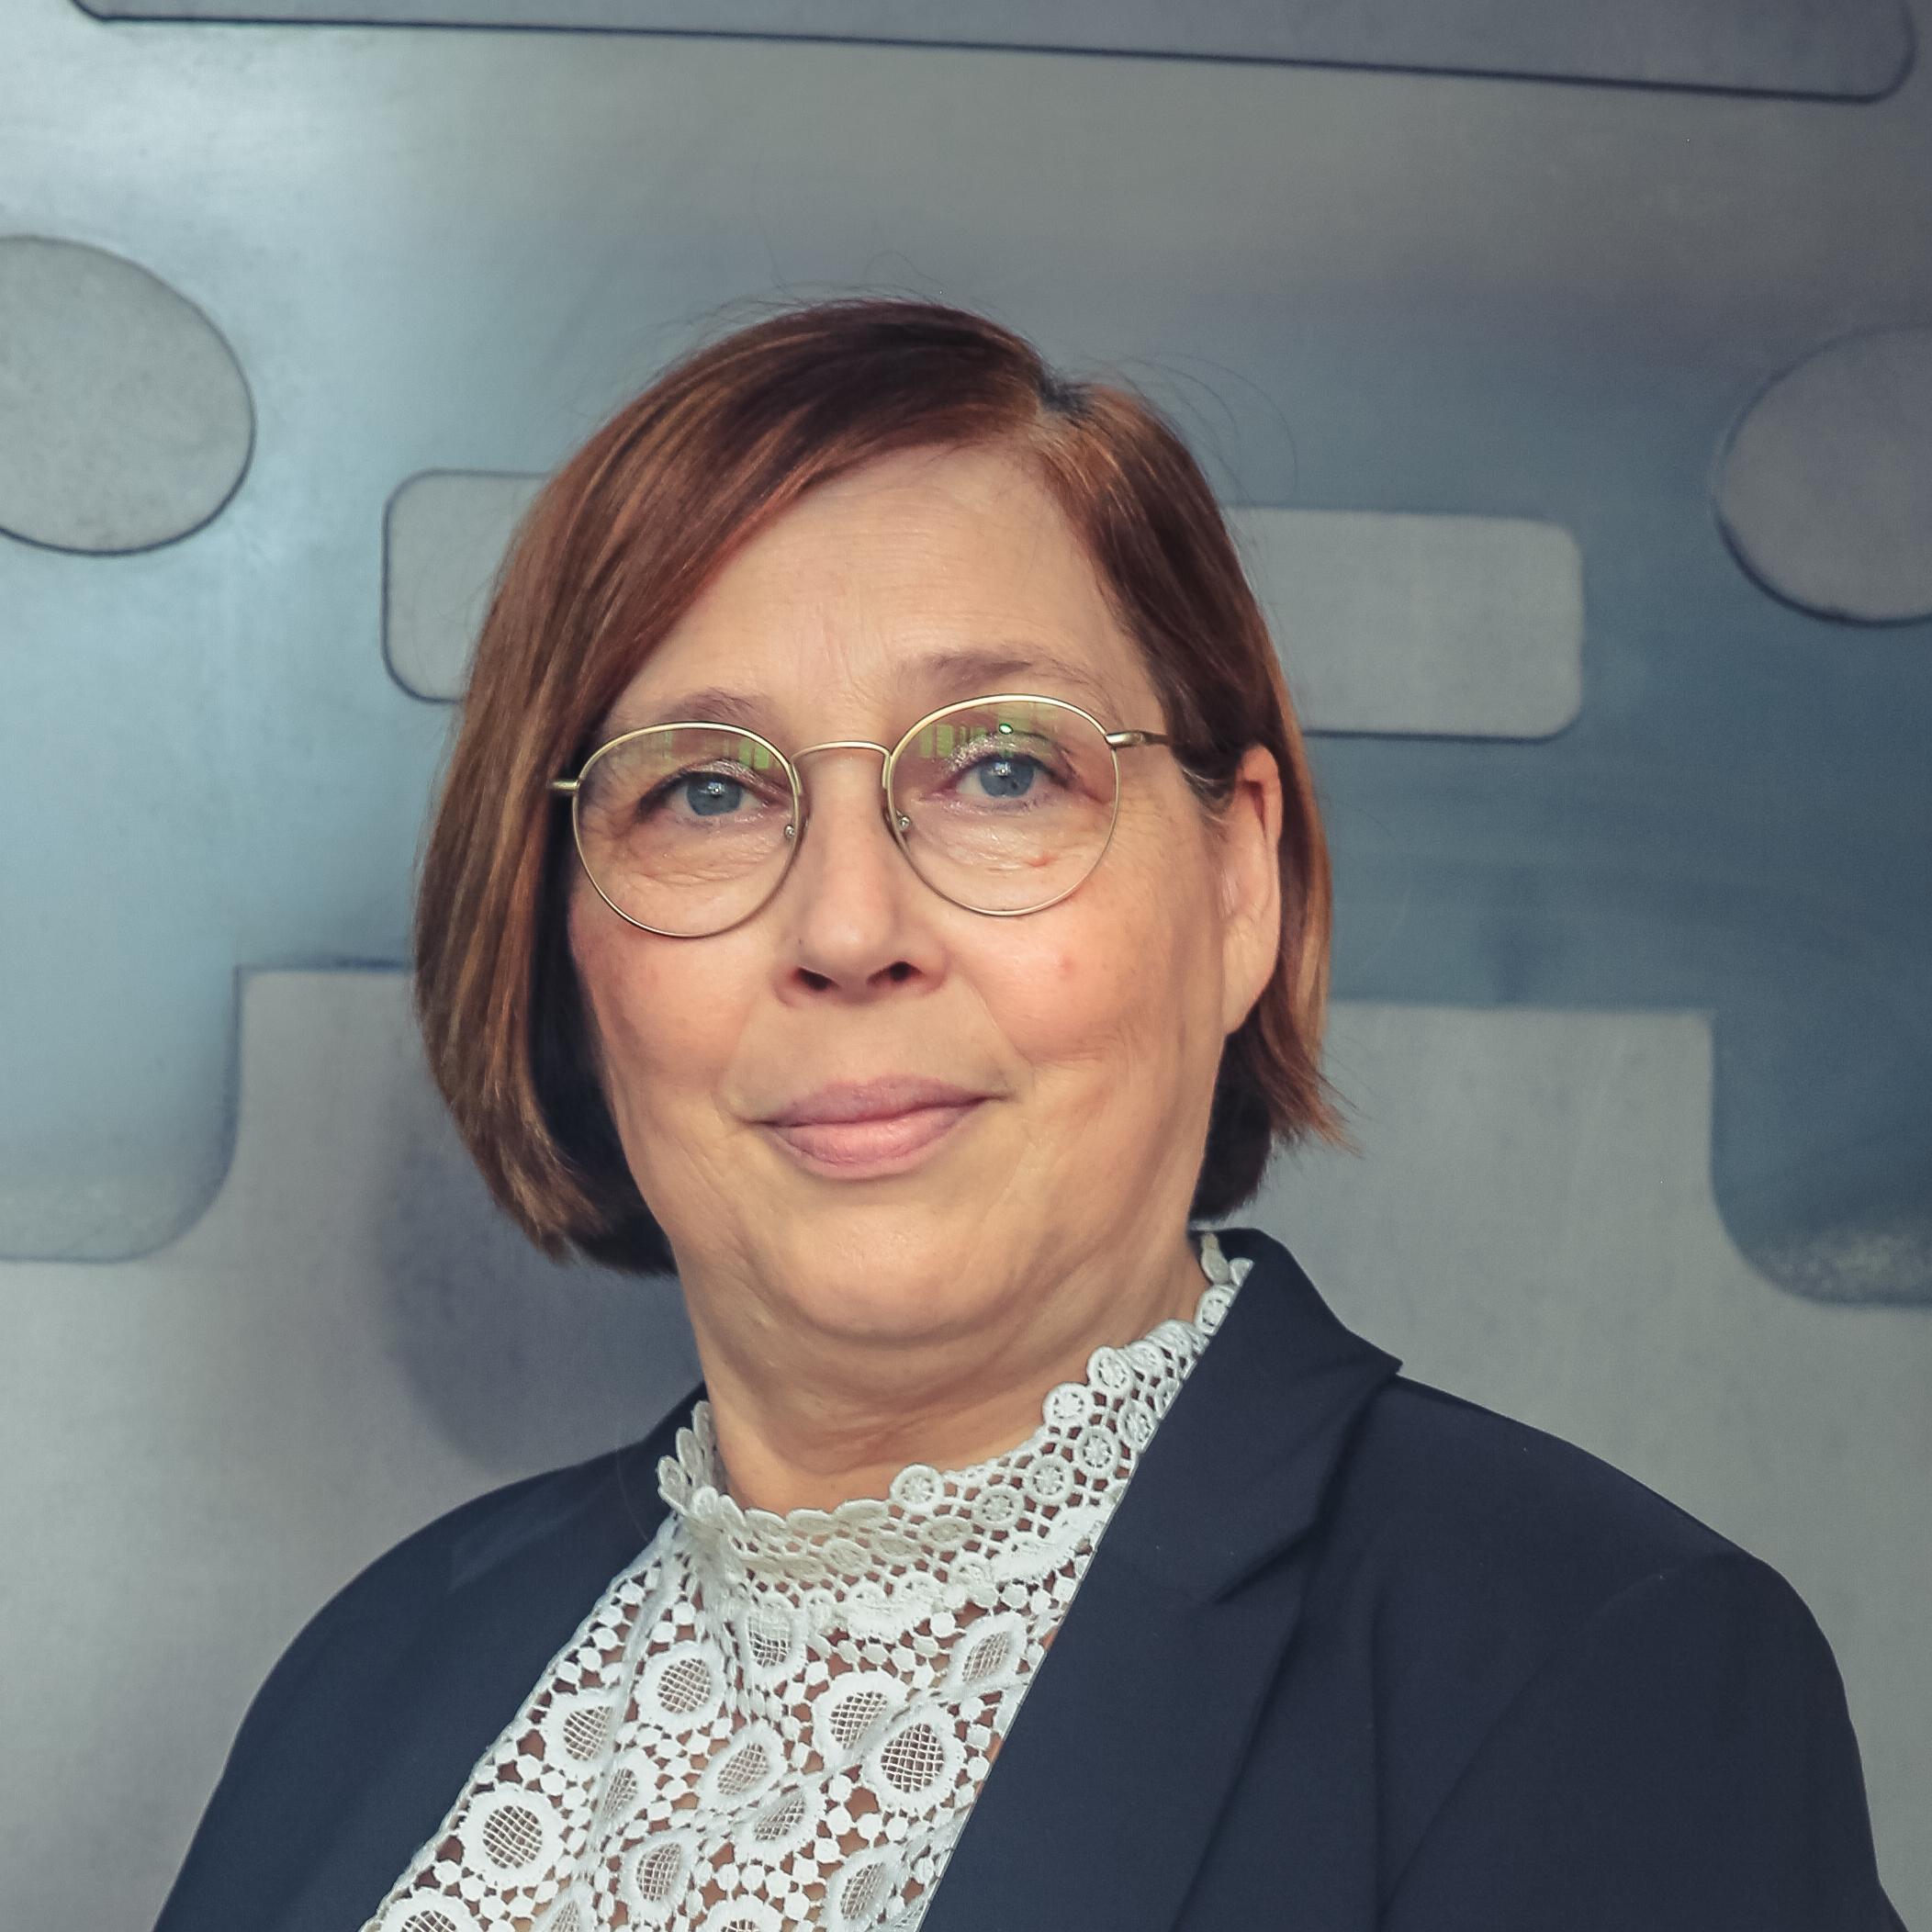 Corina Verjans